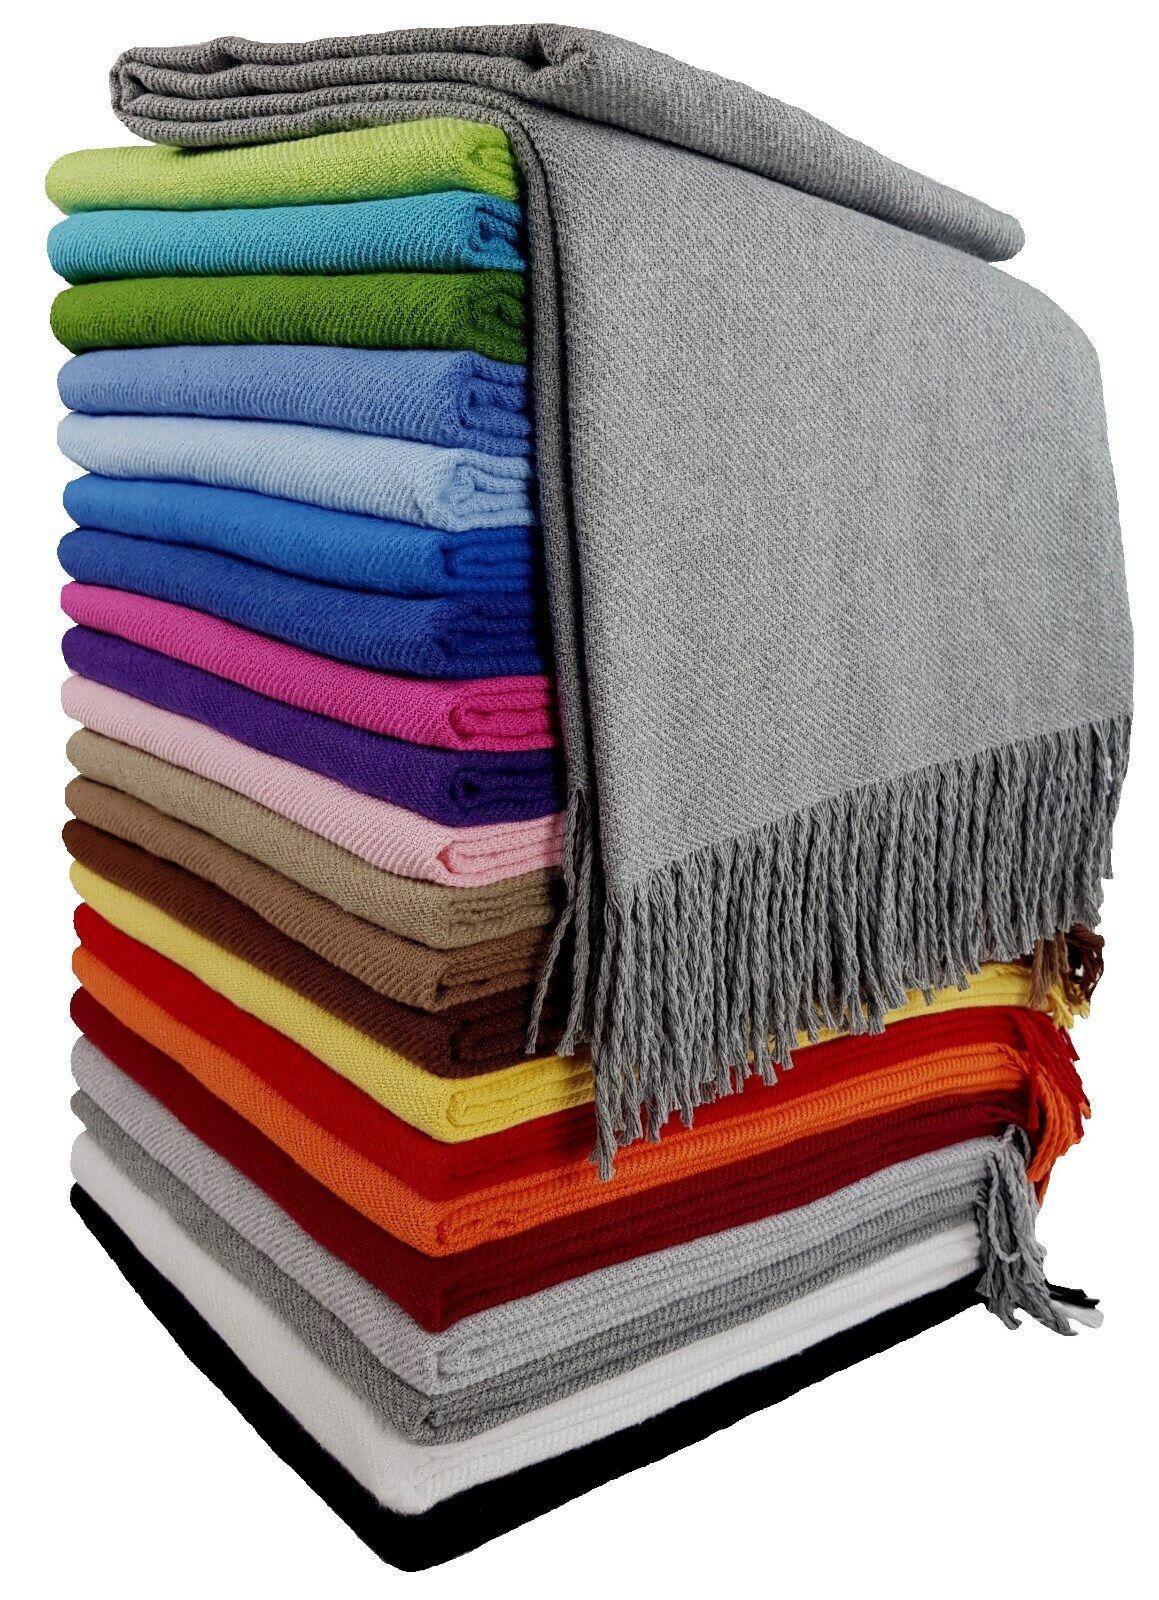 100% Baumwolldecke Wohndecke Wolldecke sehr weiches Plaid 130x170cm  Alle Farben